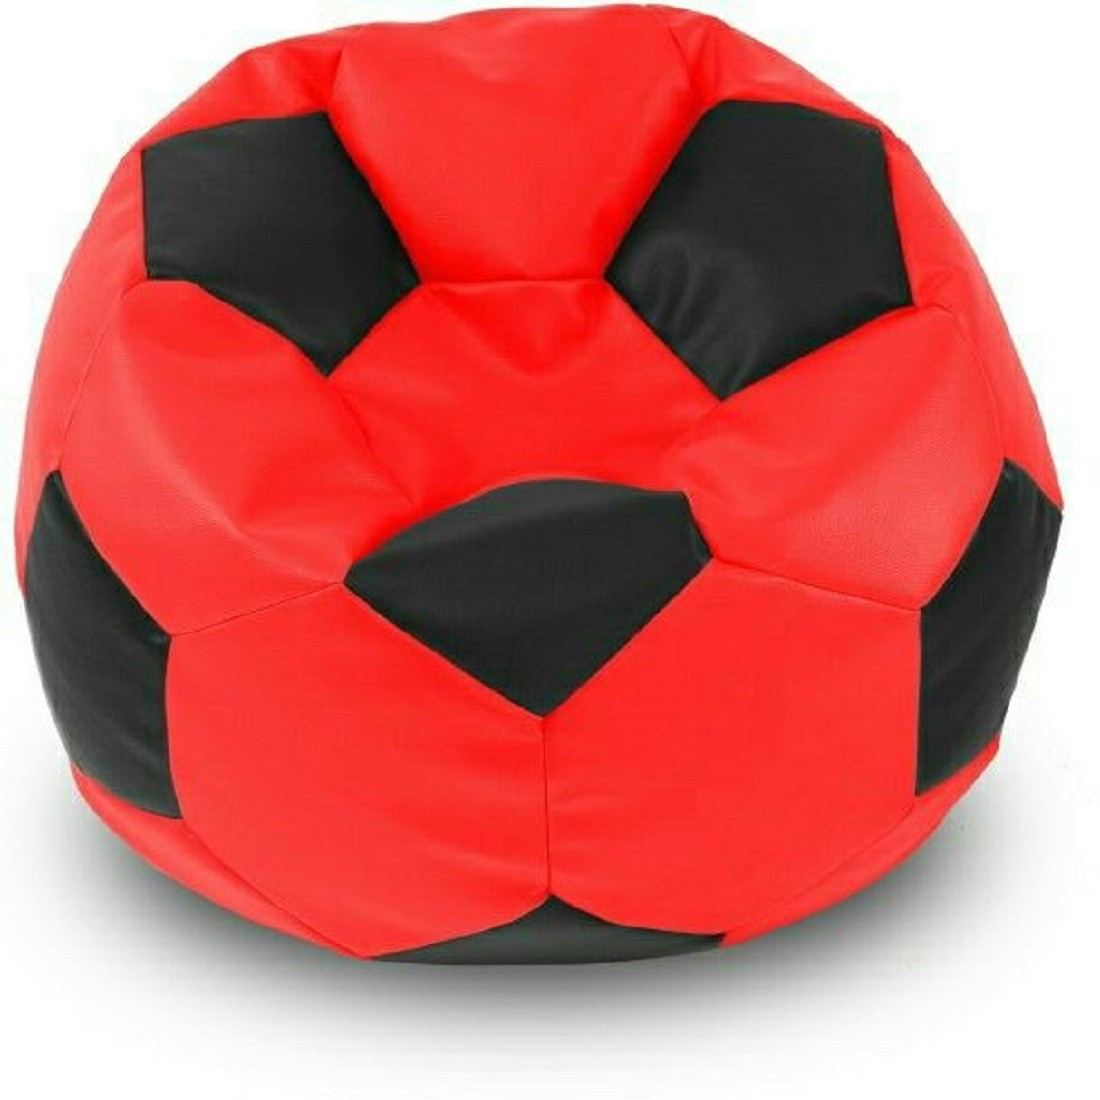 View Sultaan XL Bean Bag Cover(Black, Red) Furniture (Sultaan)